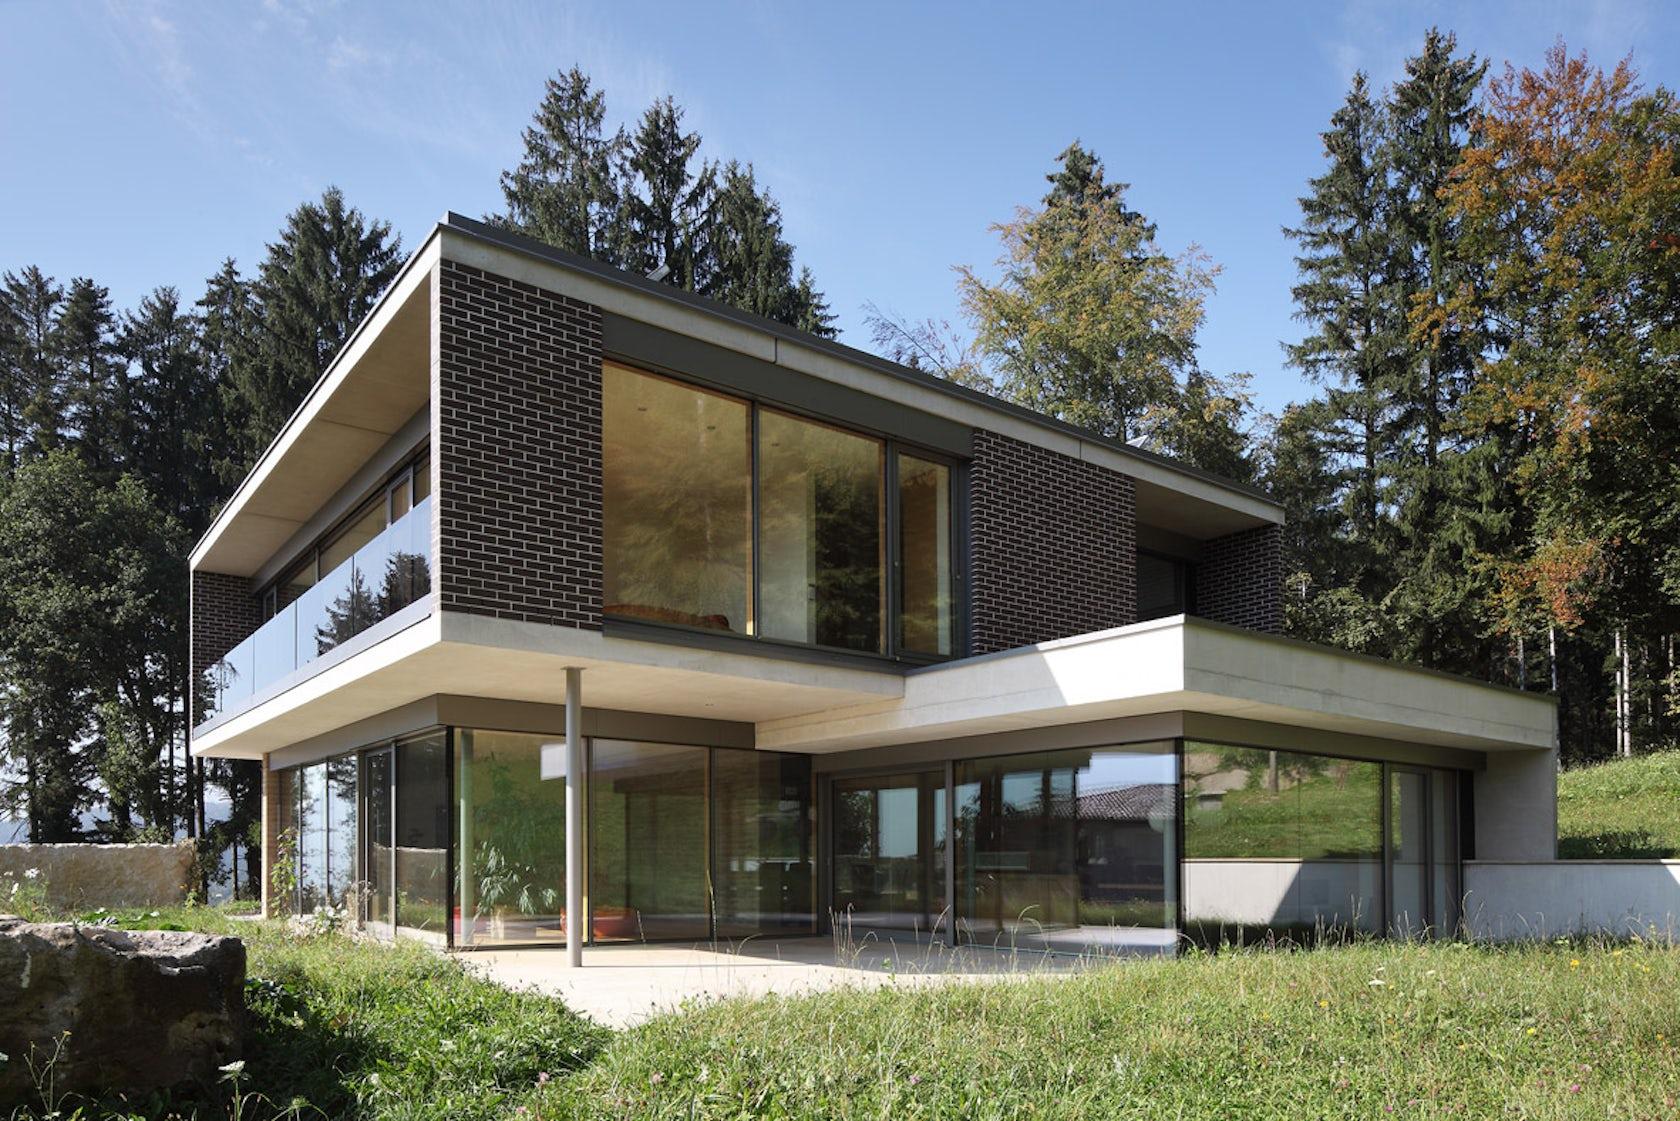 einfamilienhaus gulm architizer. Black Bedroom Furniture Sets. Home Design Ideas